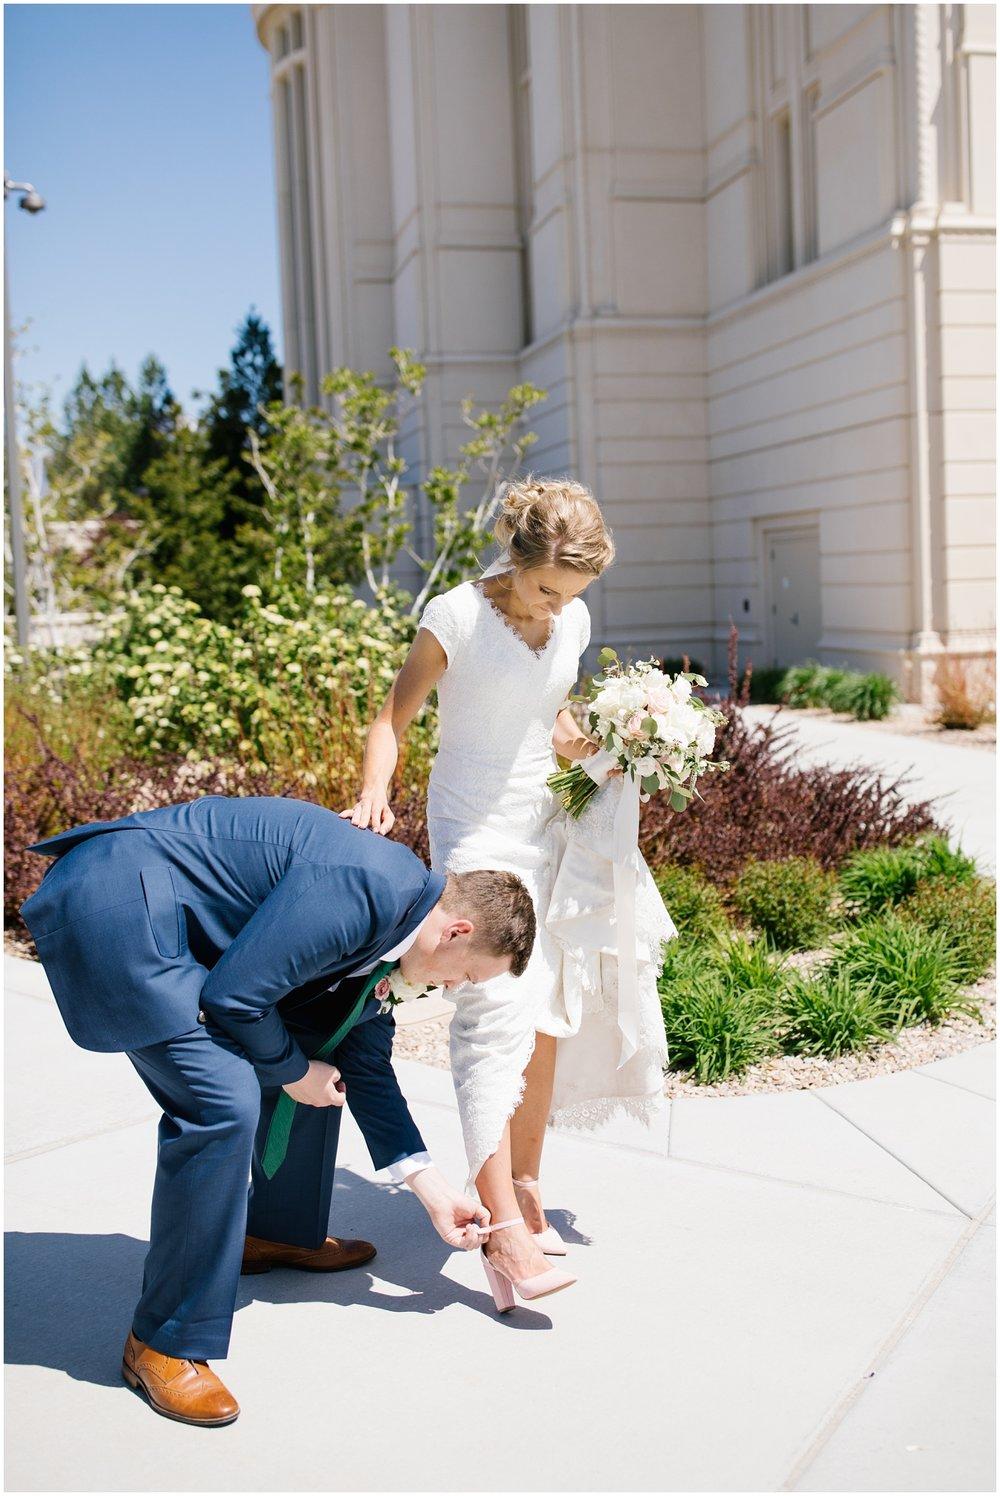 TA-Wedding-166_Lizzie-B-Imagery-Utah-Wedding-Photographer-Park-City-Salt-Lake-City-Thanksgiving-Point-Ashton-Gardens-Lehi-Utah.jpg